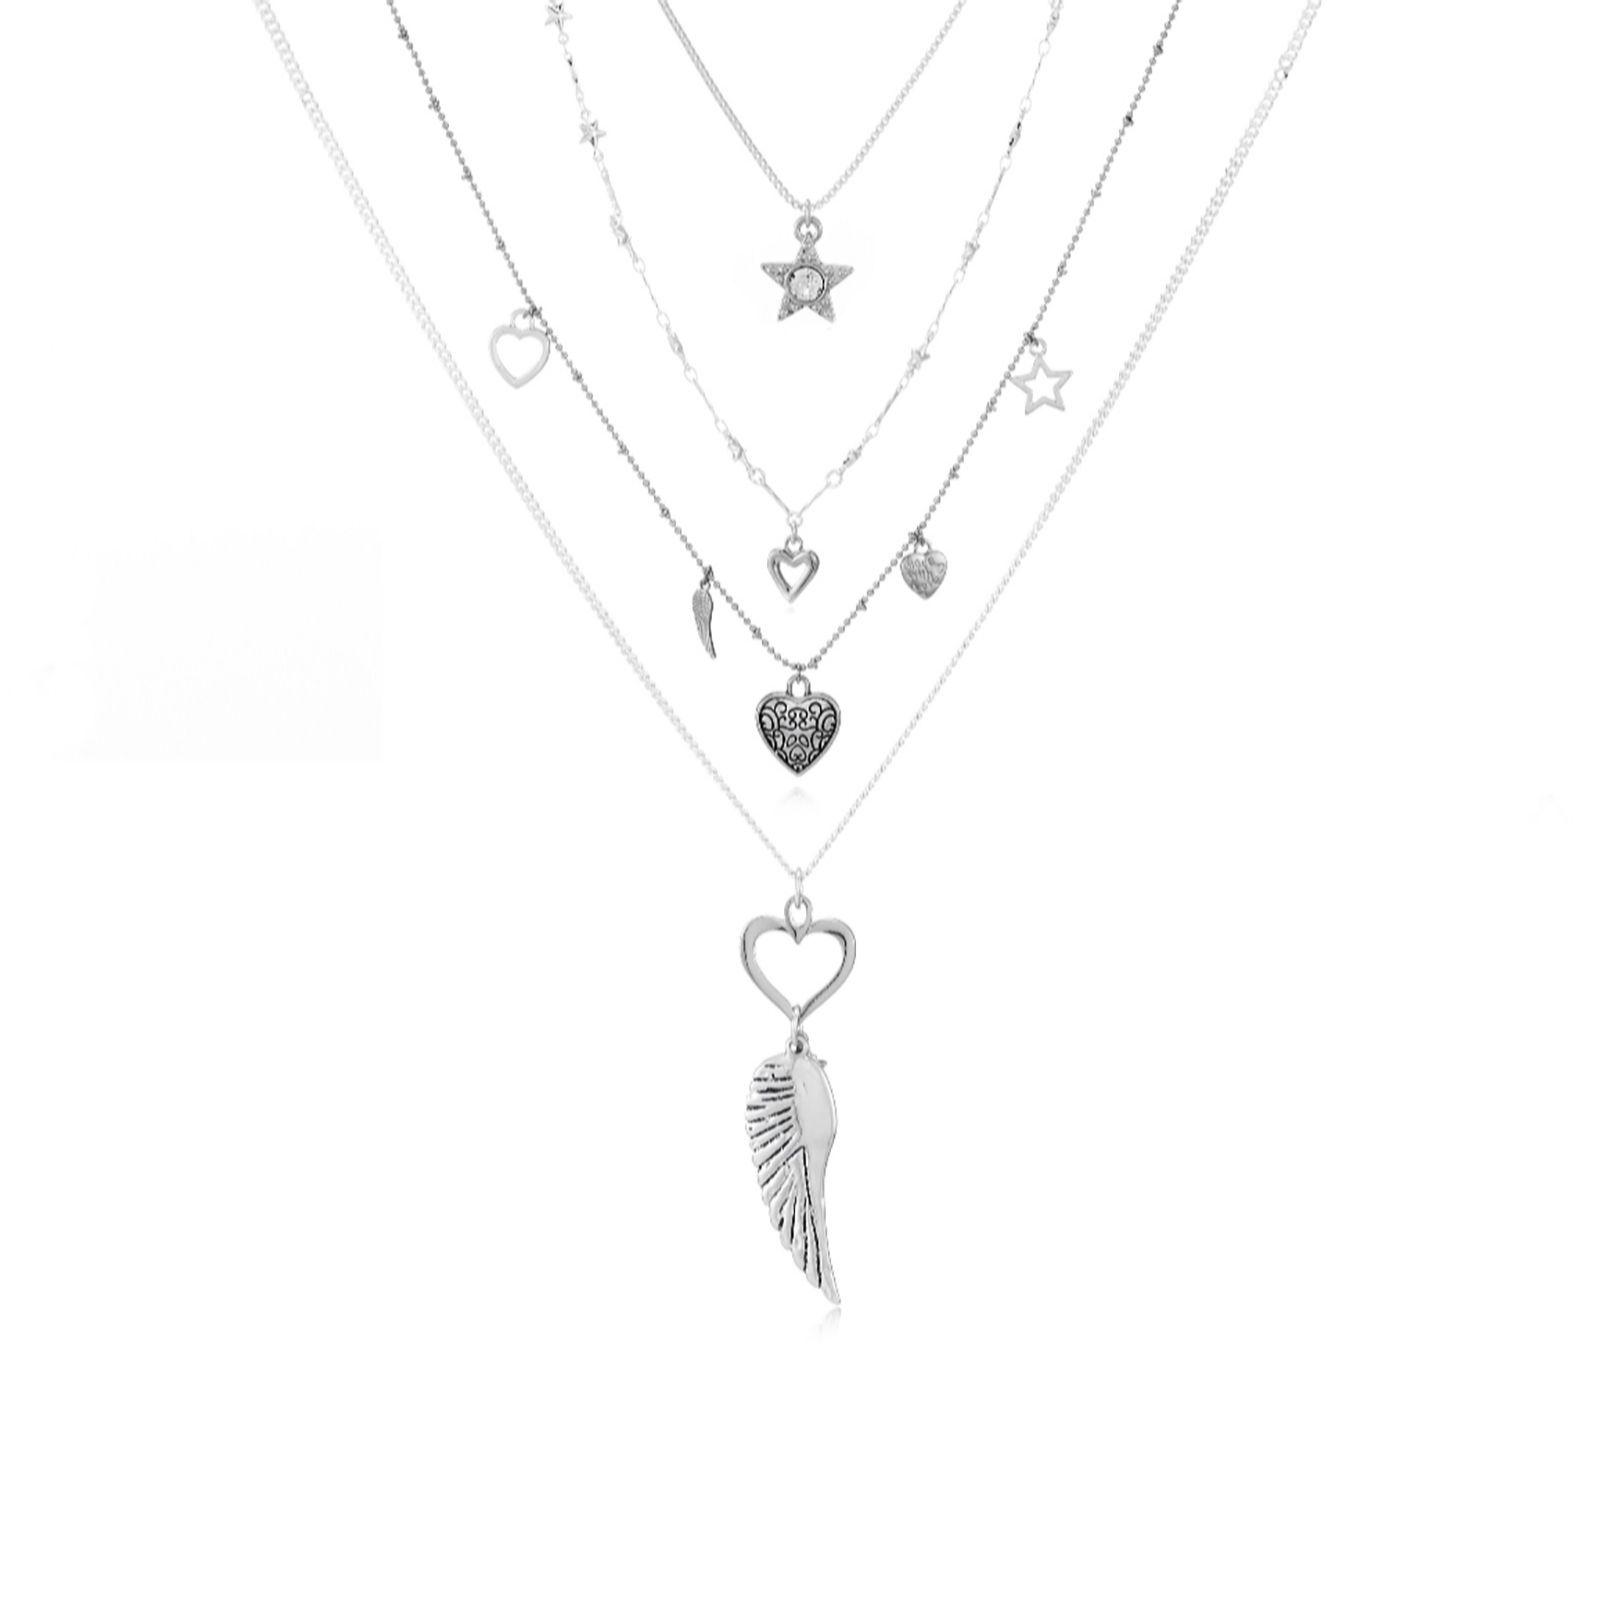 3fa7d8840f055e Bibi Bijoux Set of 4 Charm Necklaces - QVC UK